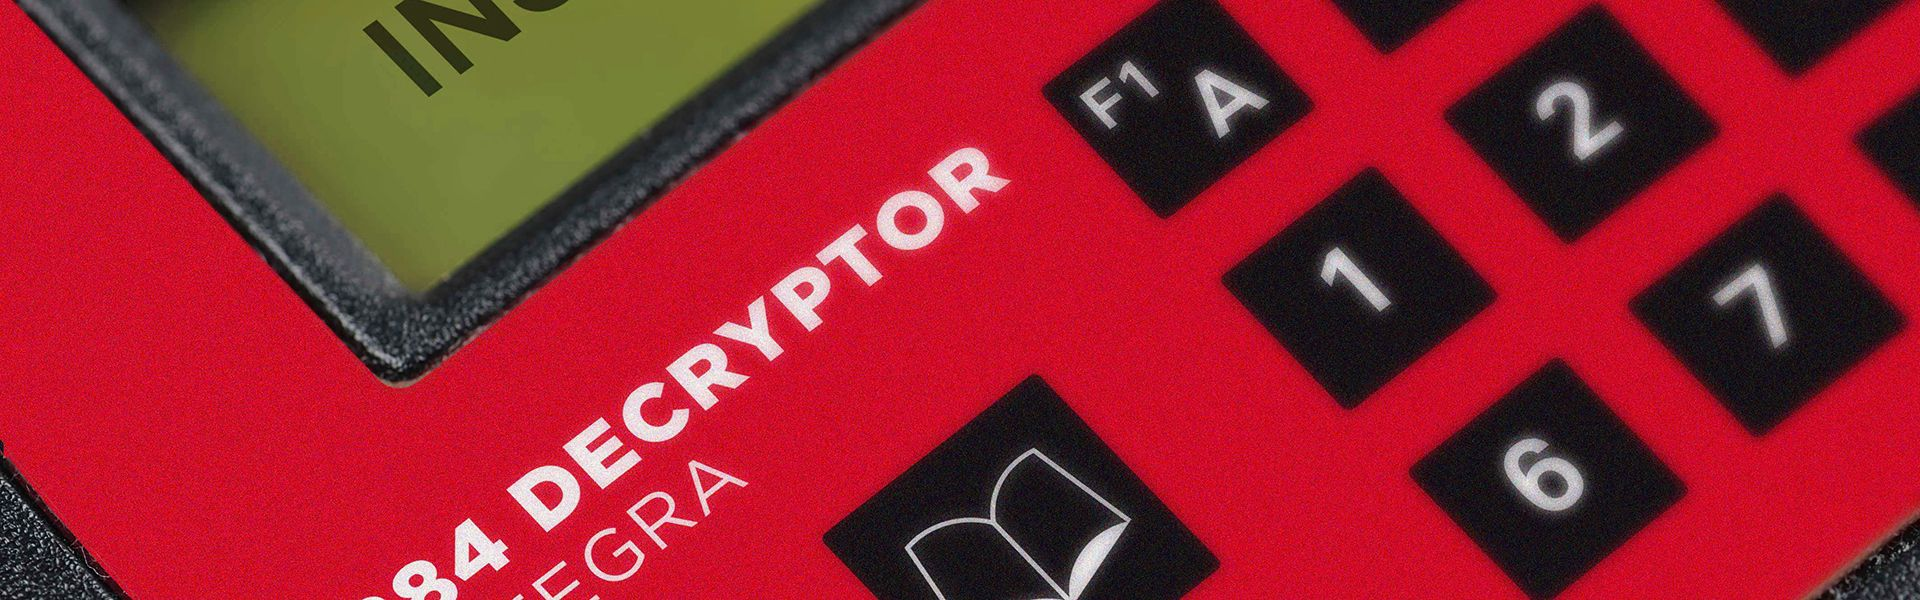 884 Decryptor Ultegra